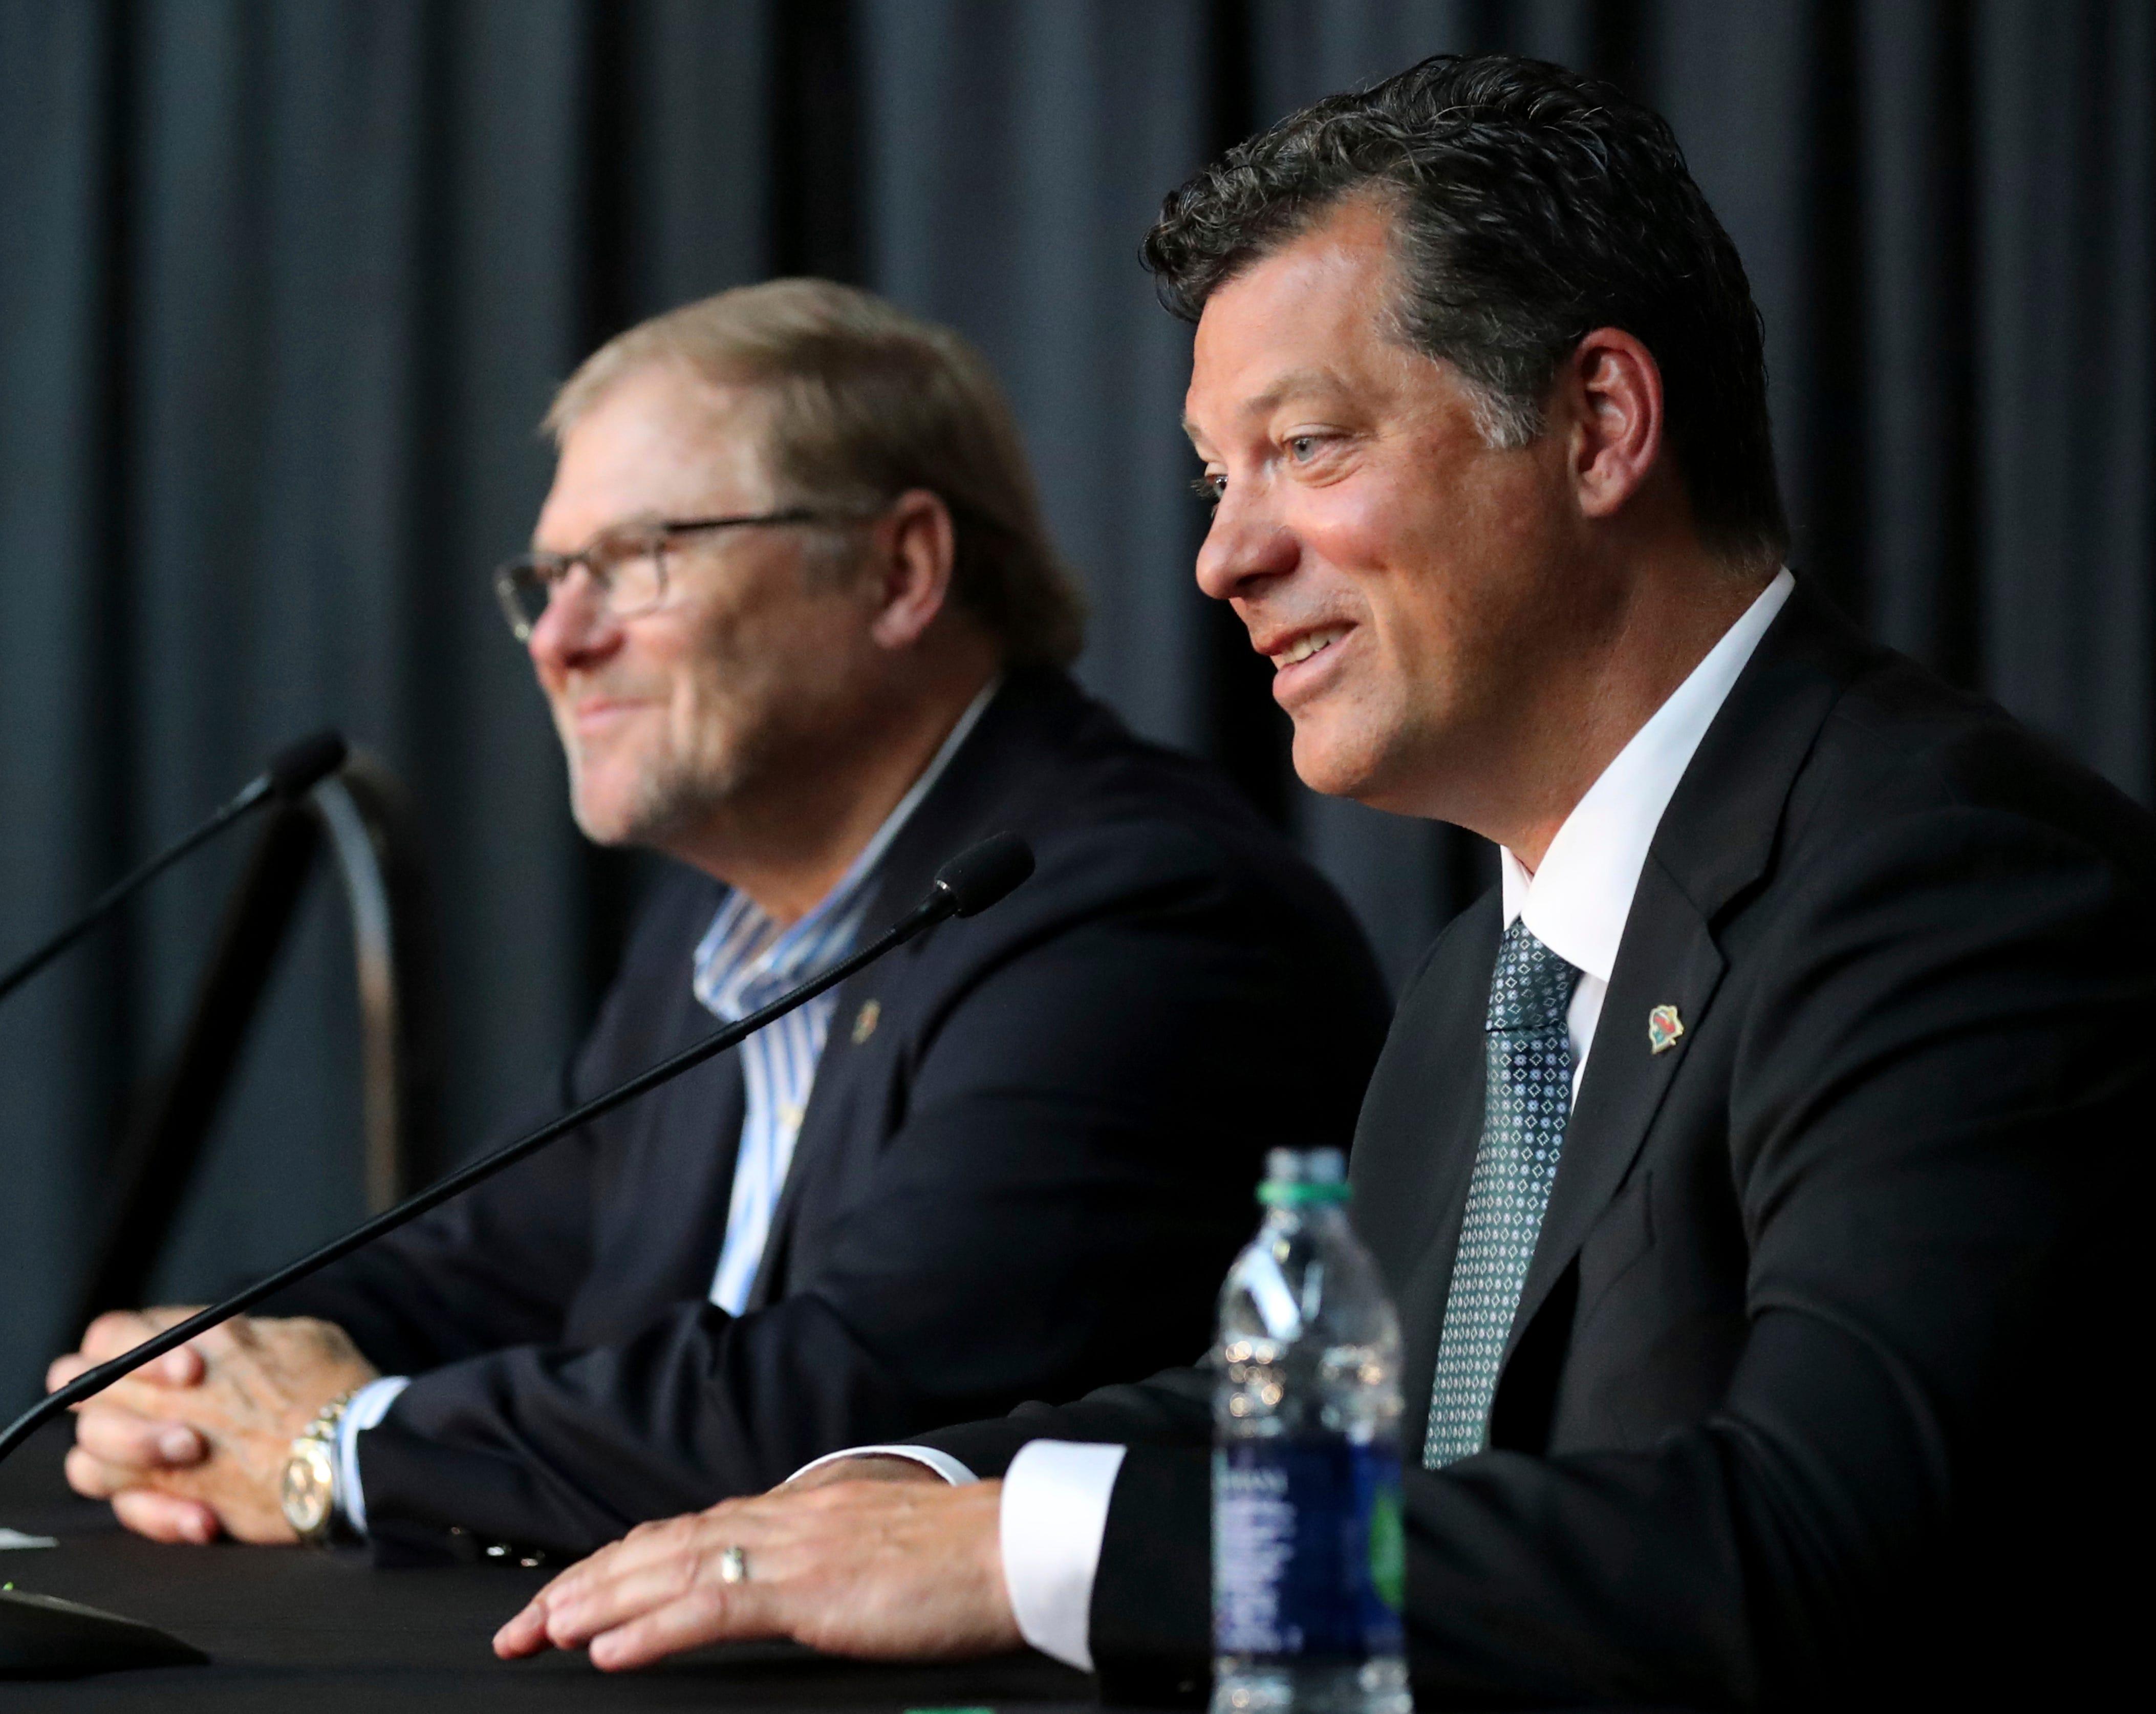 Bill Guerin finally gets the Minnesota Wild GM job he interviewed for last year